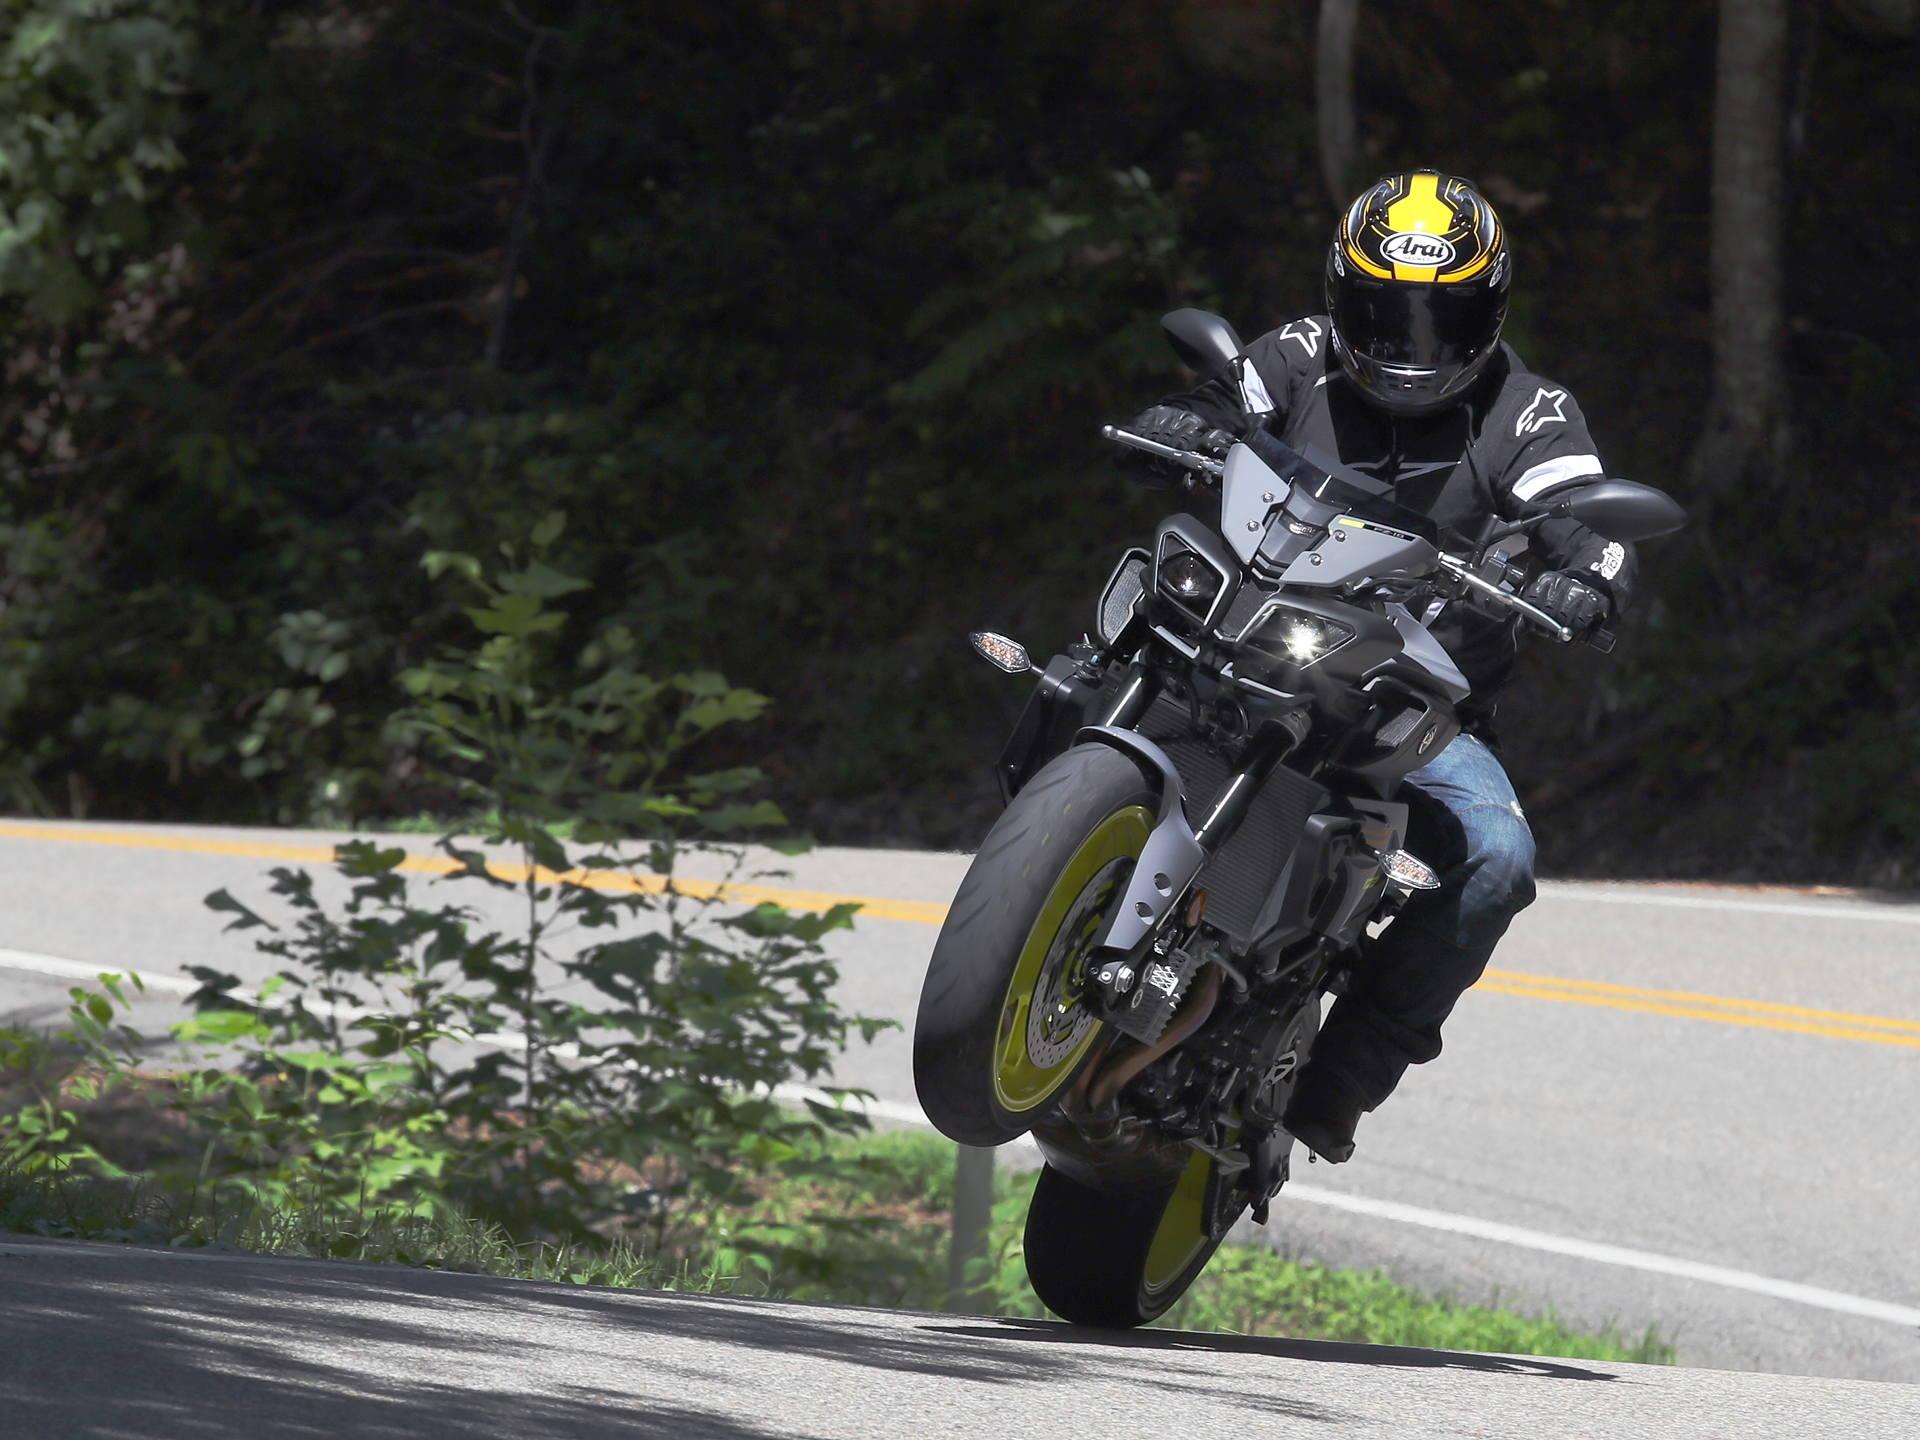 2017 Yamaha FZ-10: MD First Ride - MotorcycleDaily com